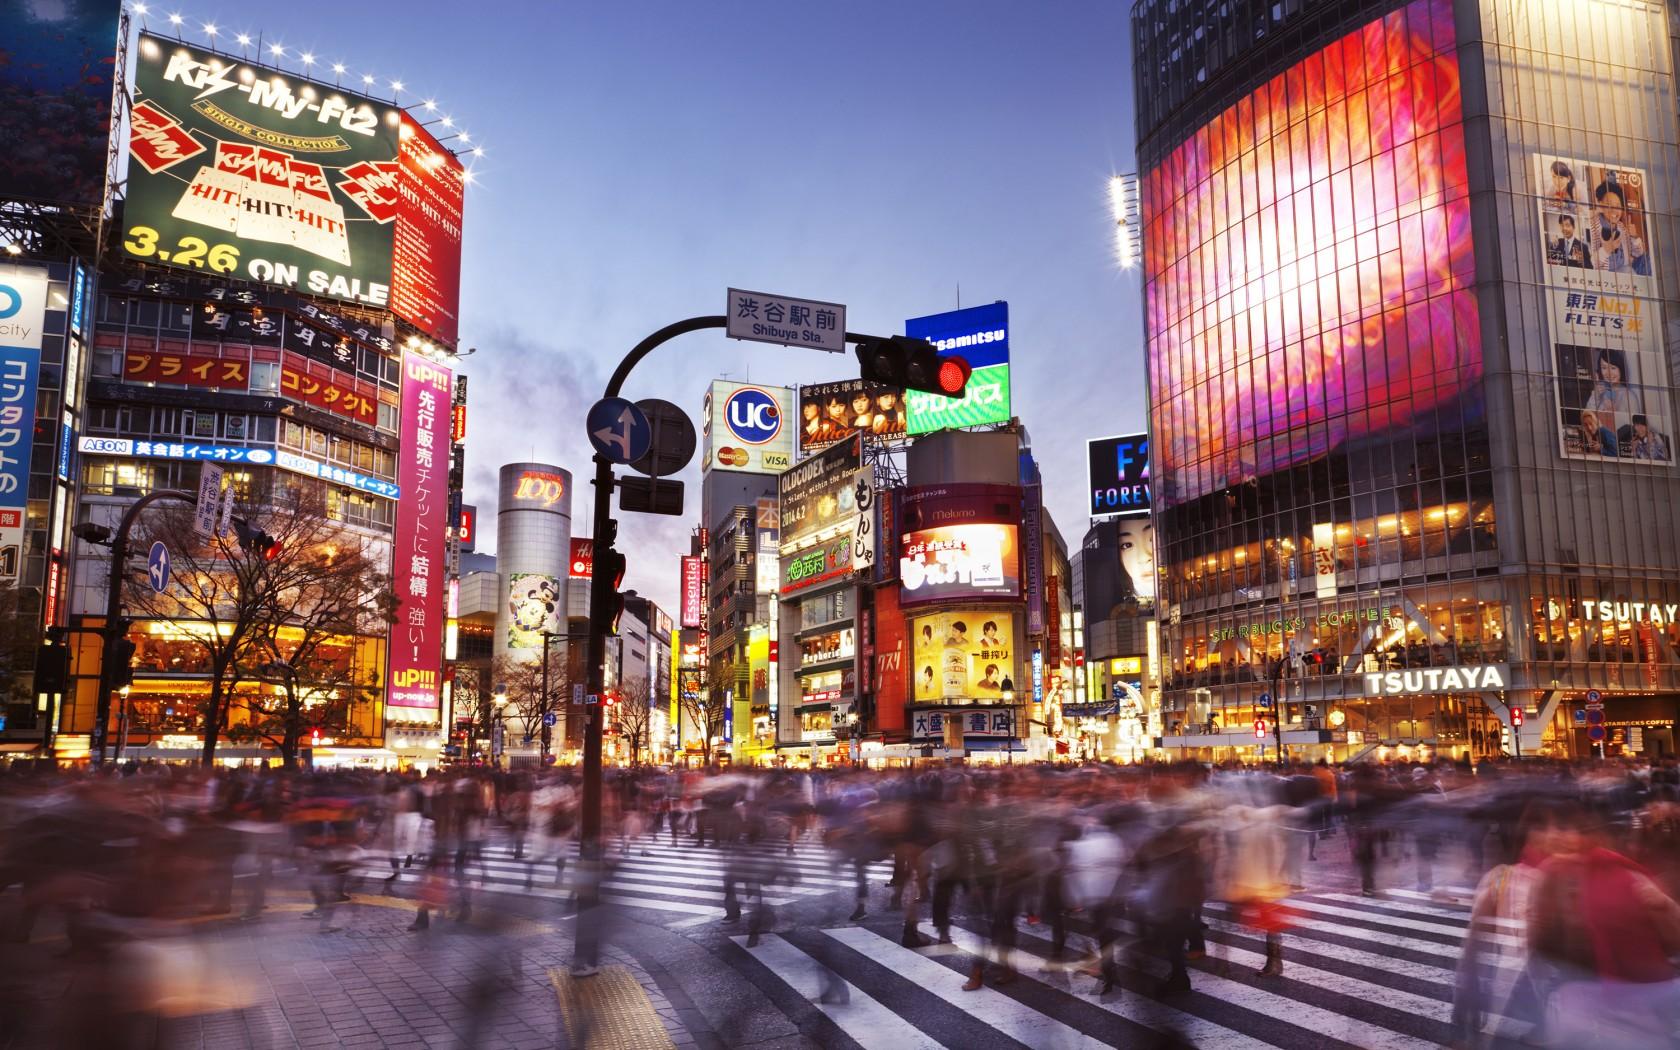 14Edited-Tokyo-rexfeatures_3902347a-1680x1050